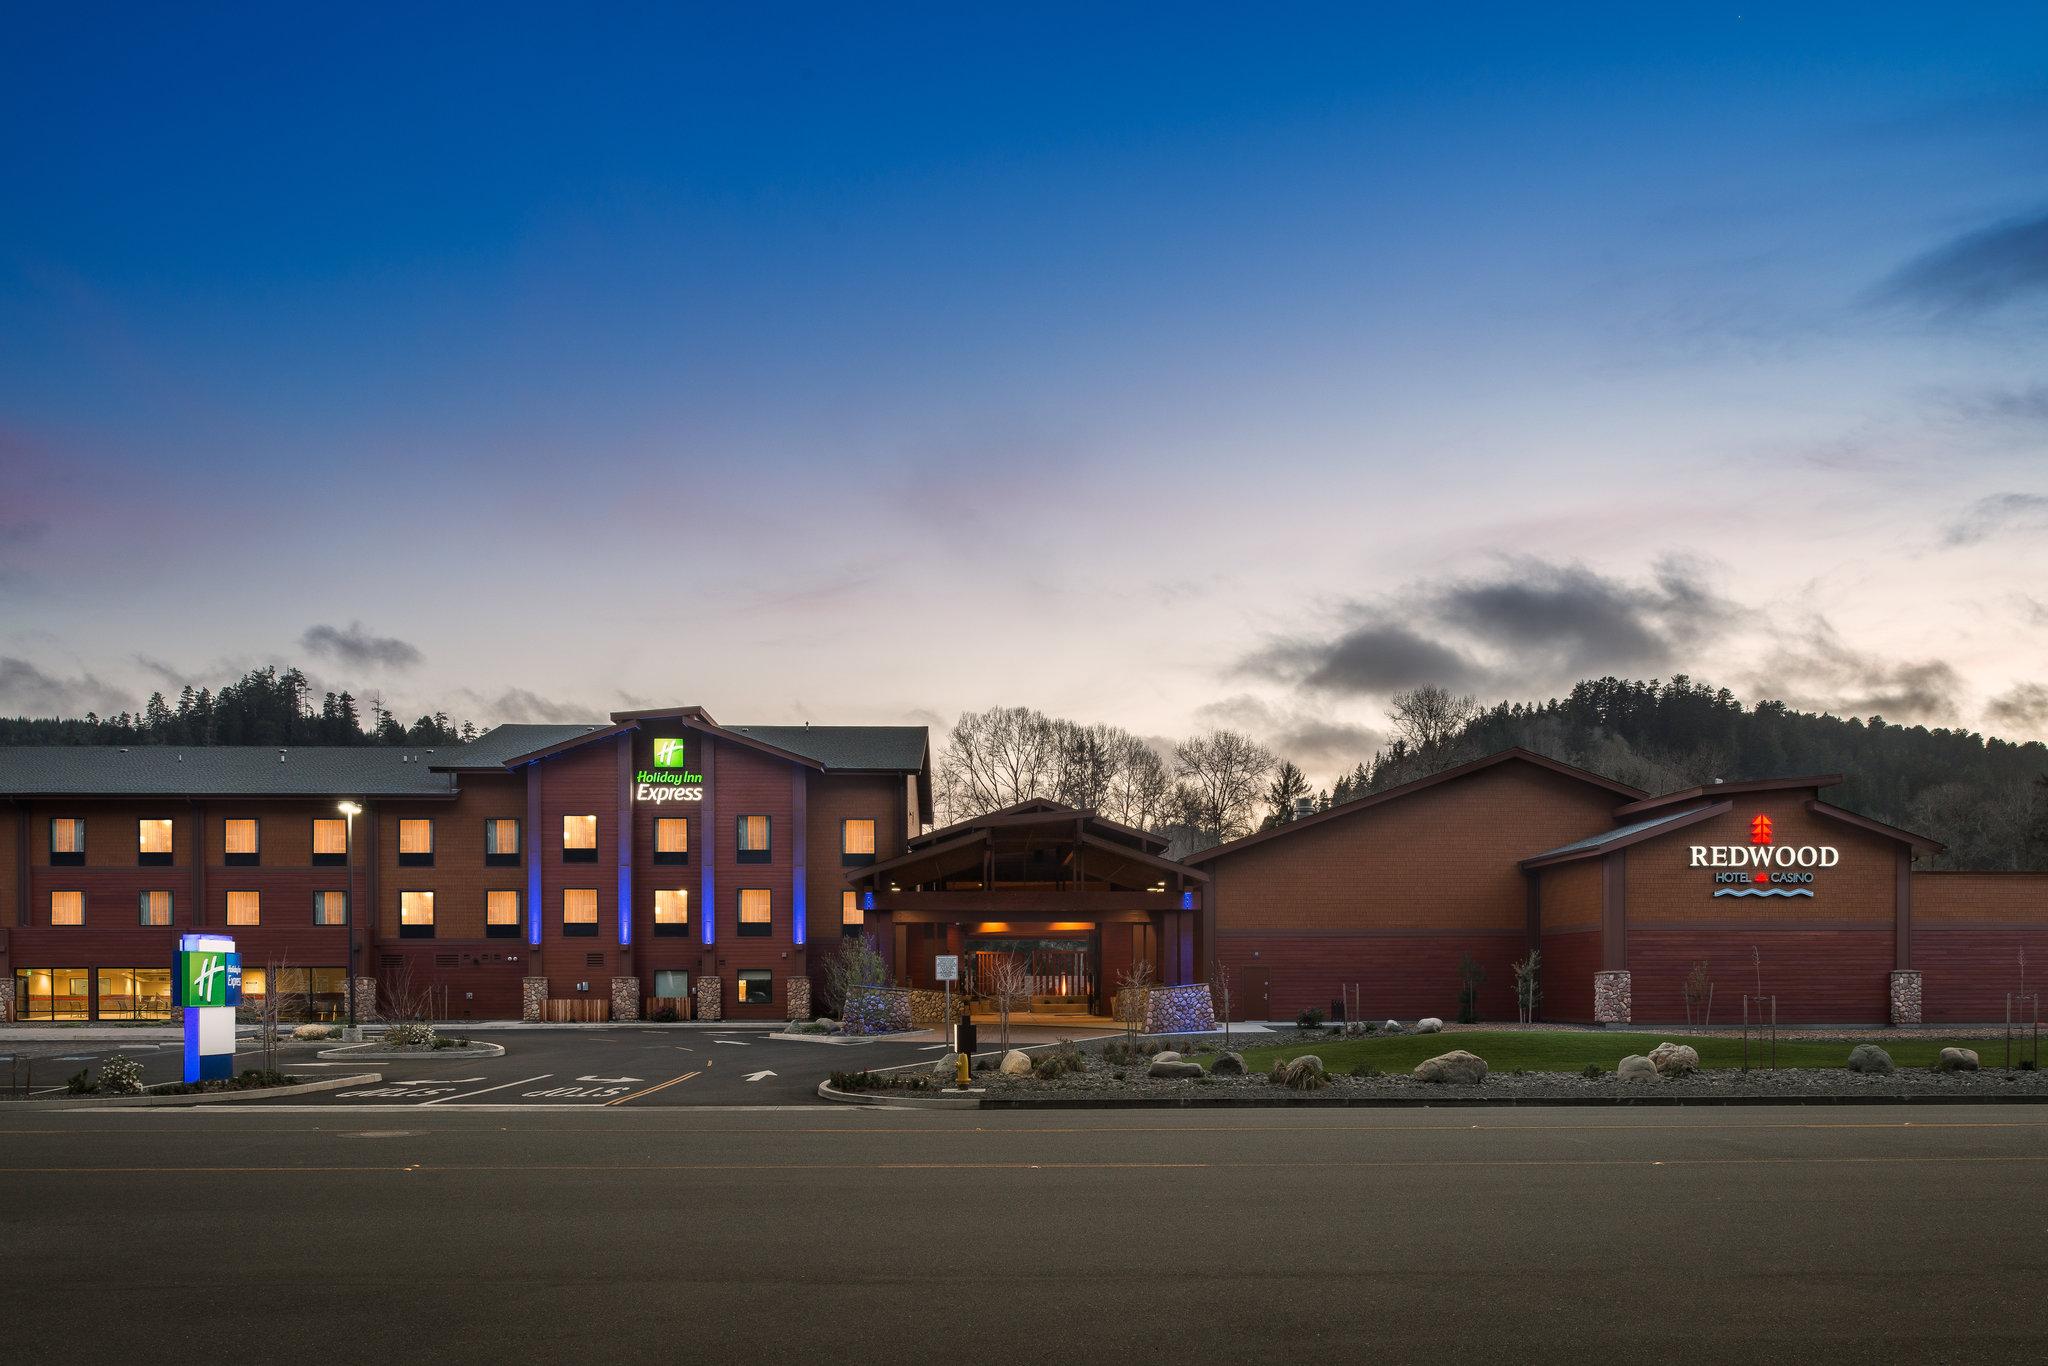 Holiday Inn Express Redwood Natl Park